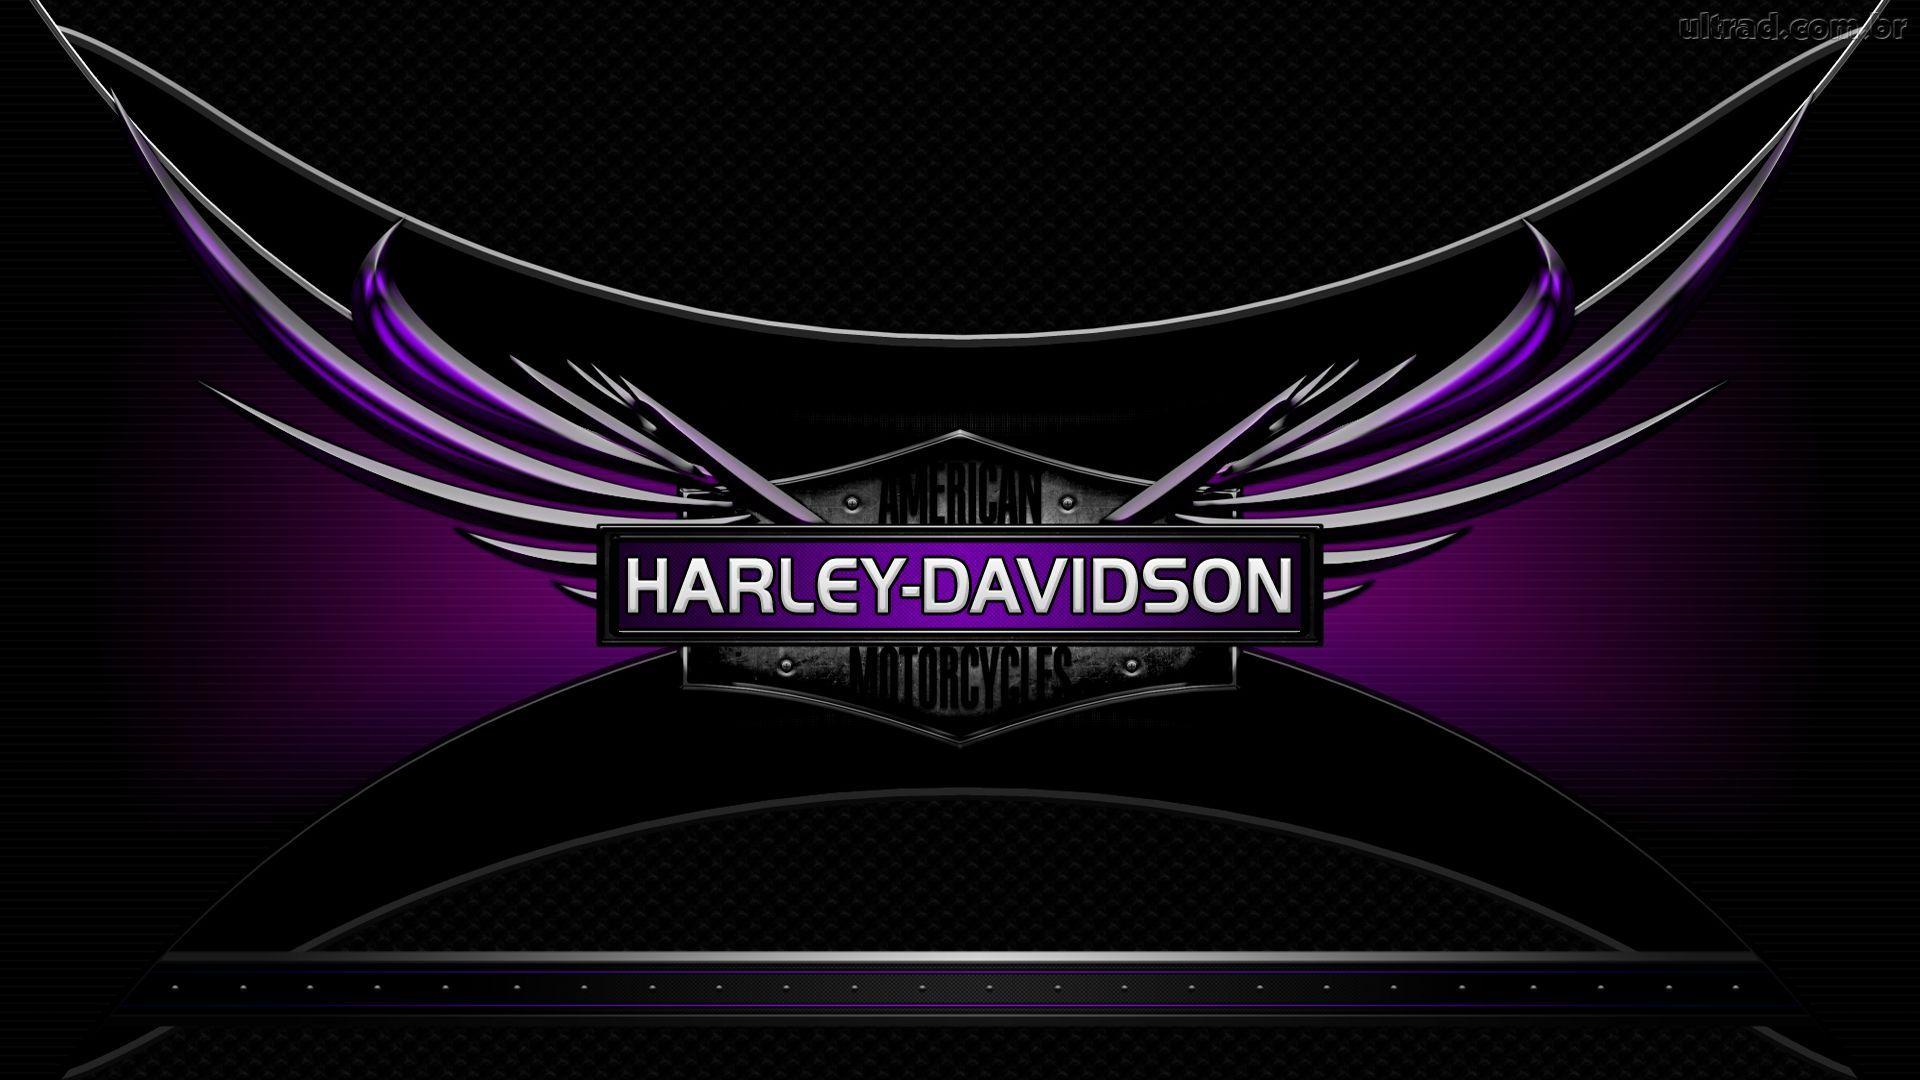 Harley Davidson Logo Wallpaper Hd